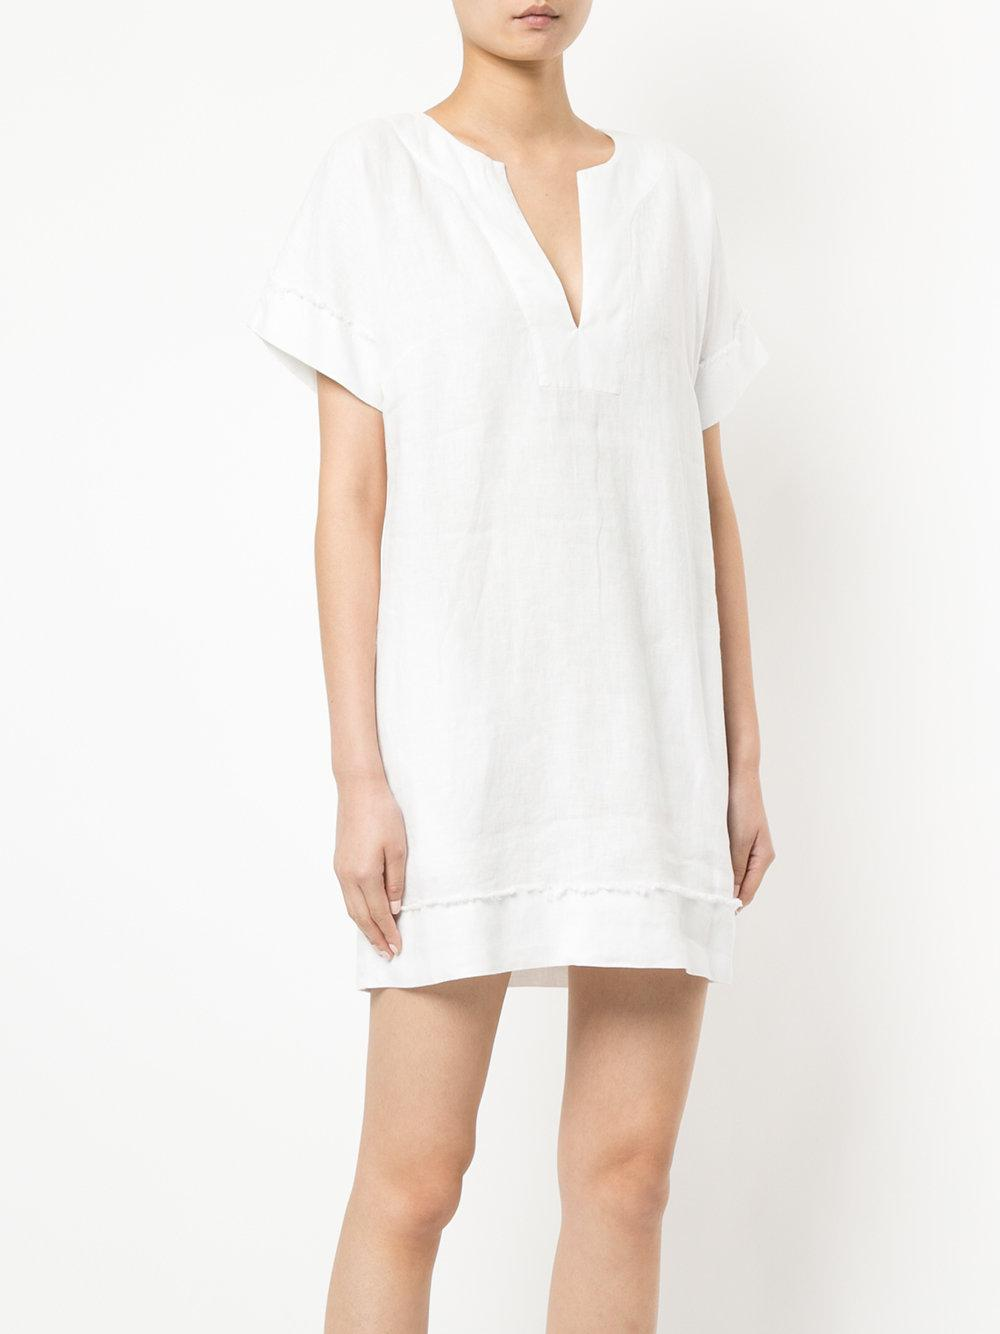 frayed detail shift dress - Nude & Neutrals Venroy 5EXVoyIn